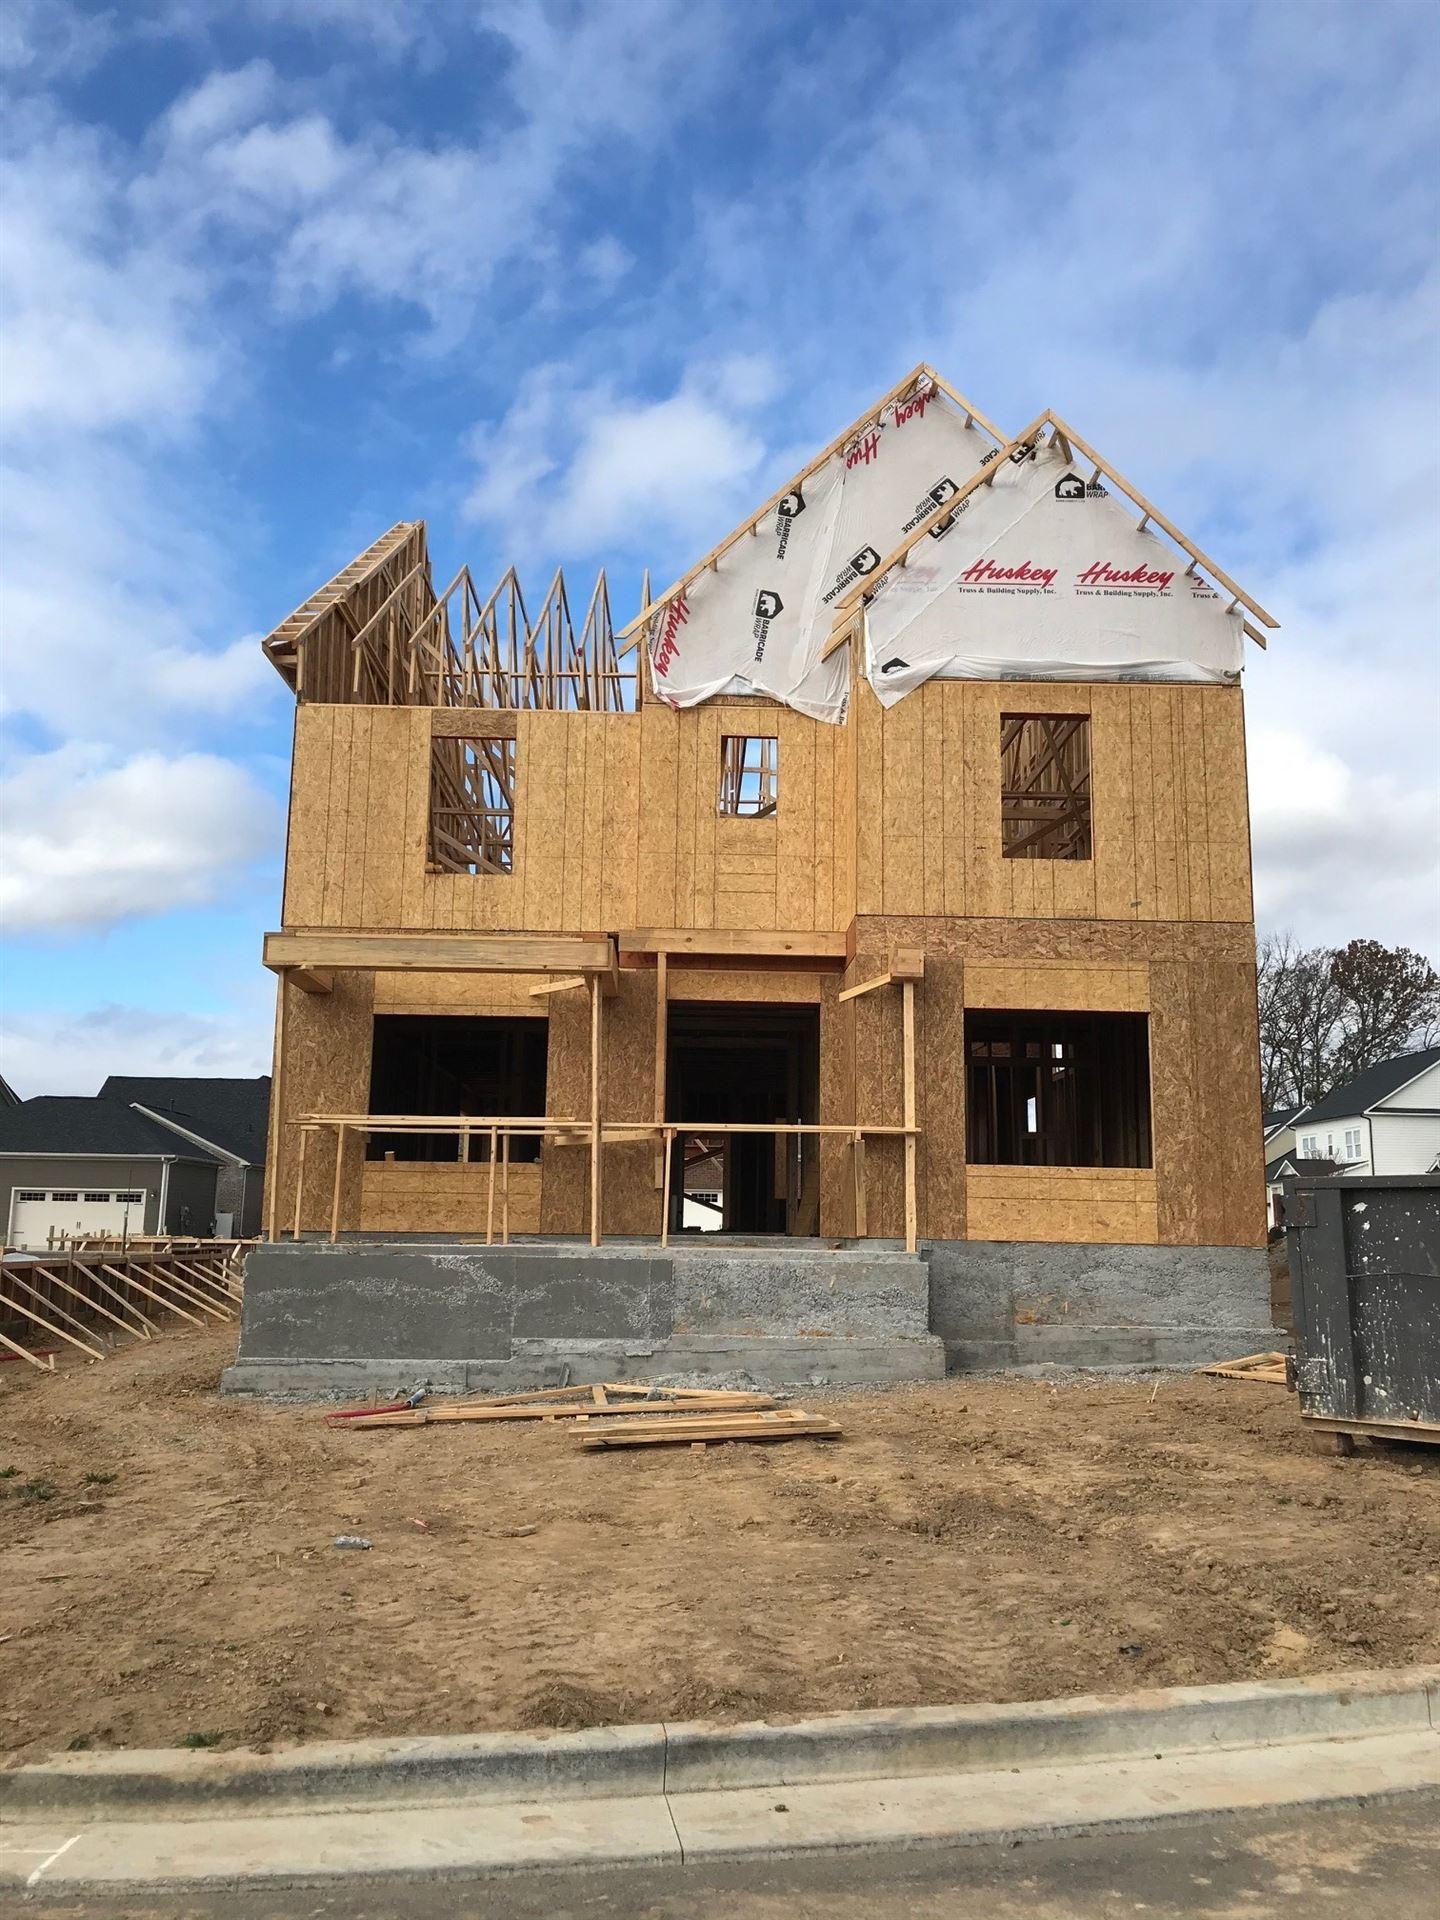 Photo of 3032 Nolencrest Way Lot 109, Franklin, TN 37067 (MLS # 2209916)